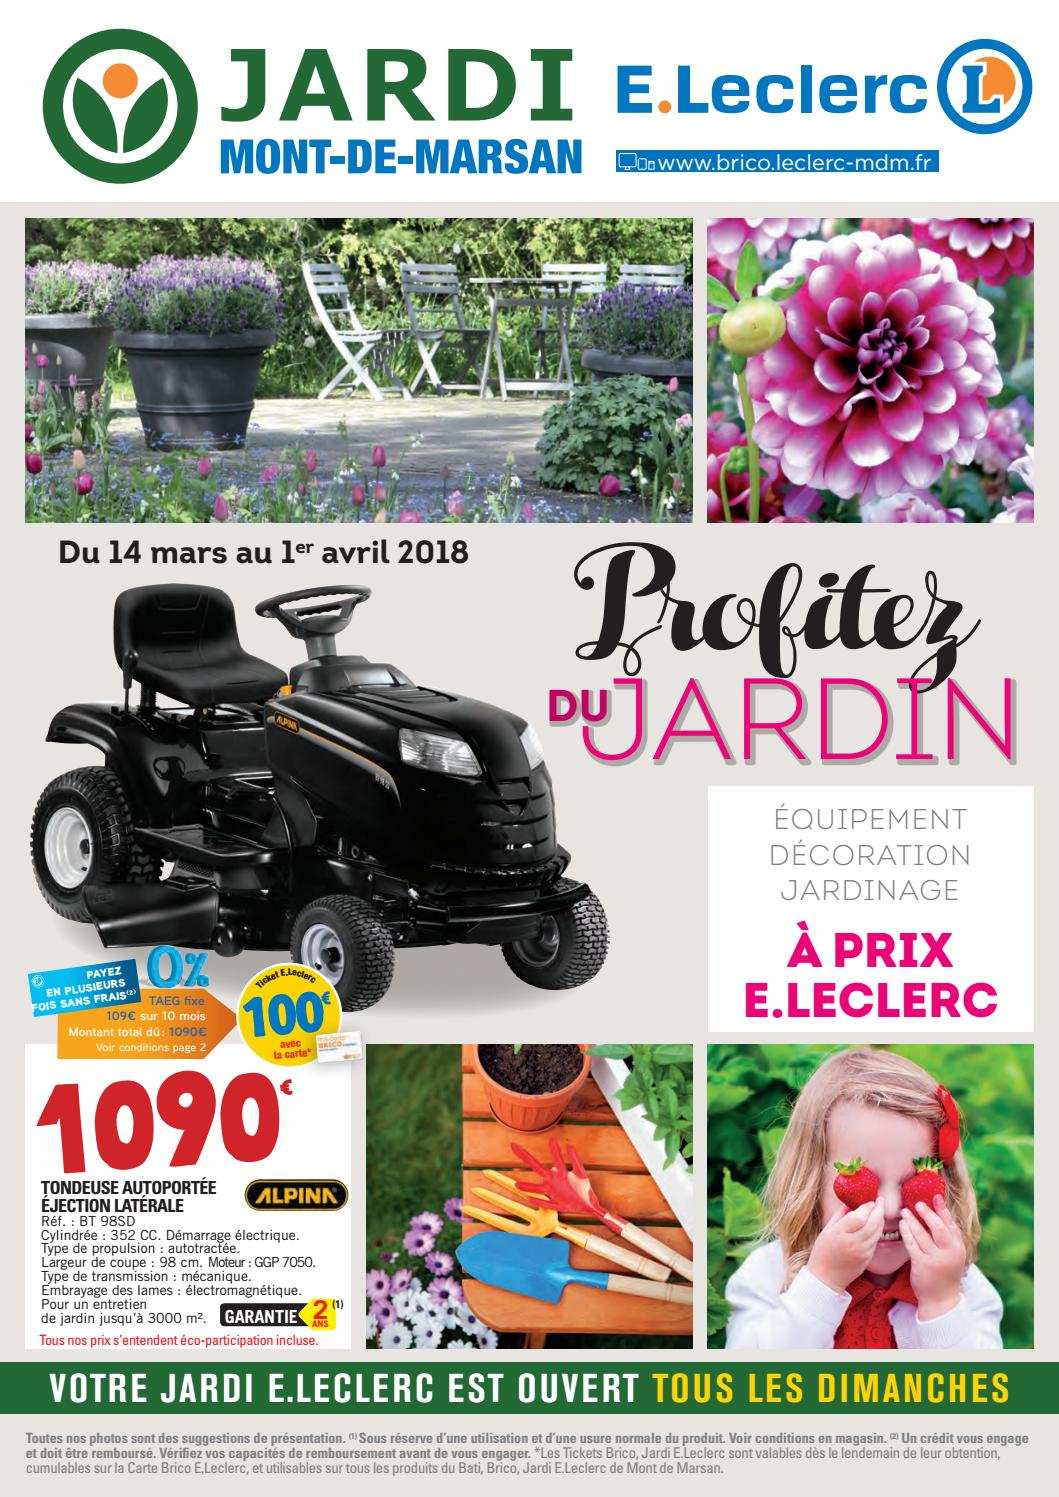 Catalogue Jardin - Jardi E.leclerc By Chou Magazine - Issuu destiné Table De Jardin Plastique Leclerc